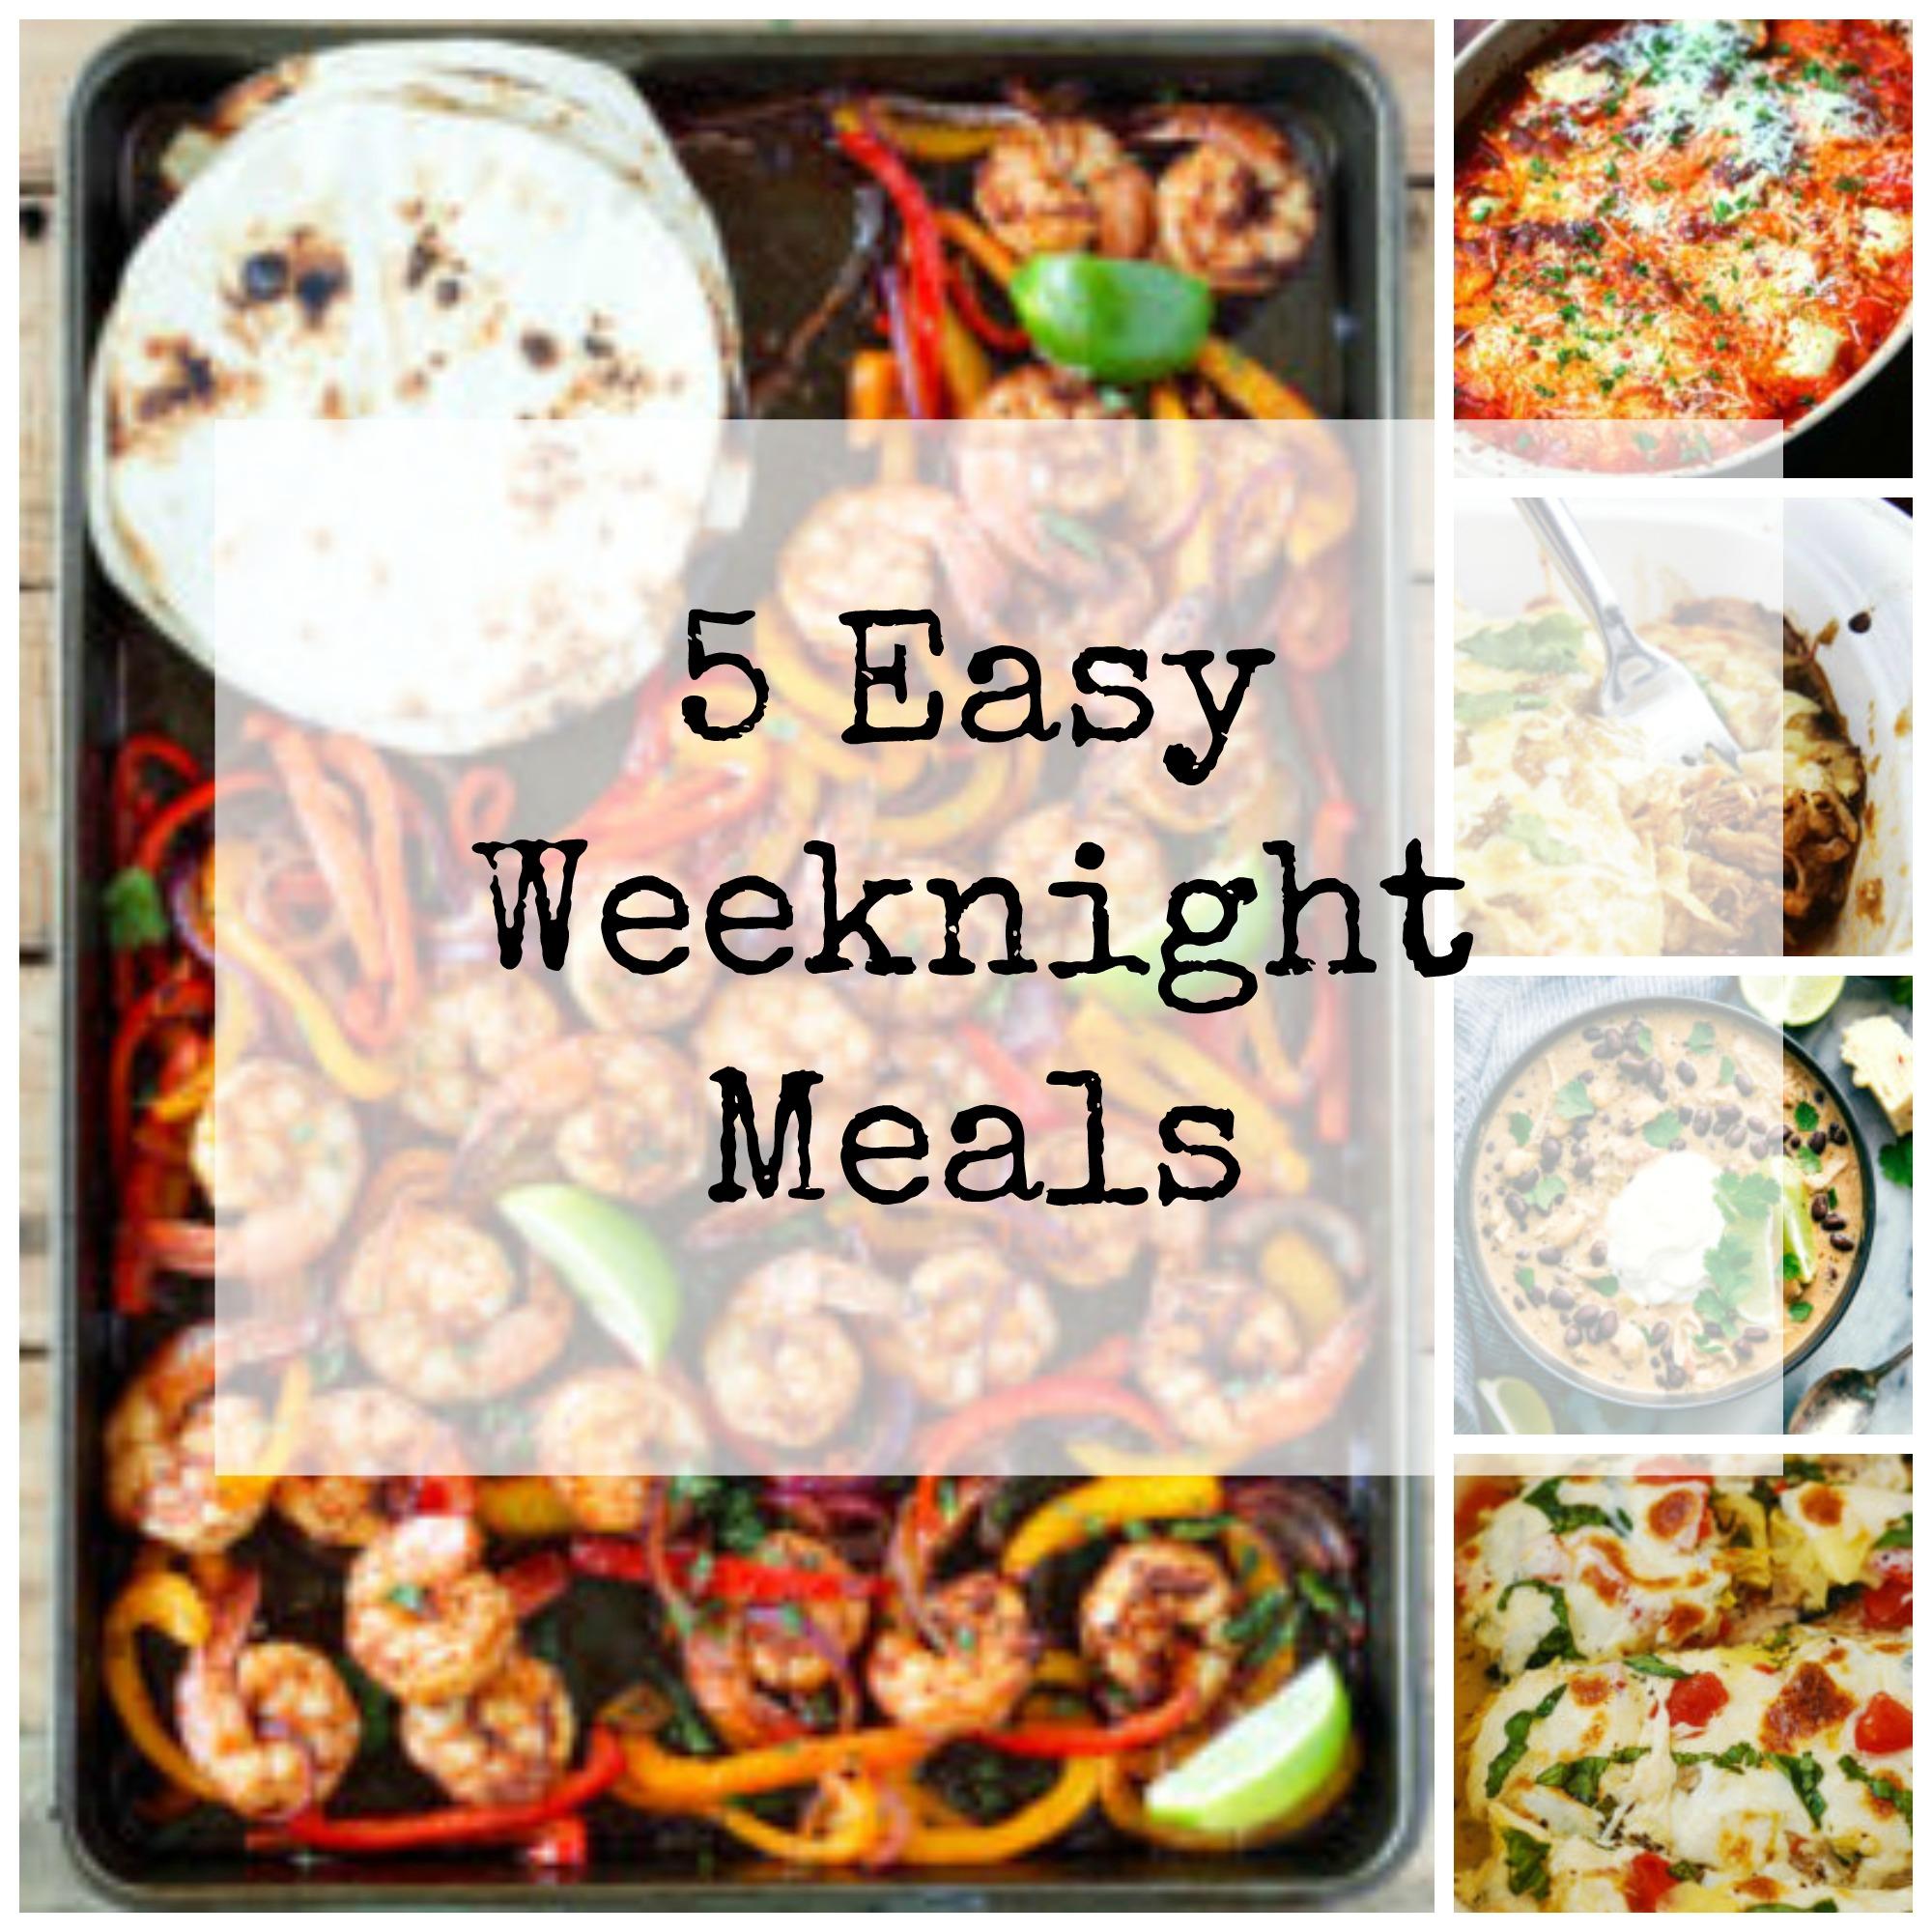 5 Easy Weeknight Meals